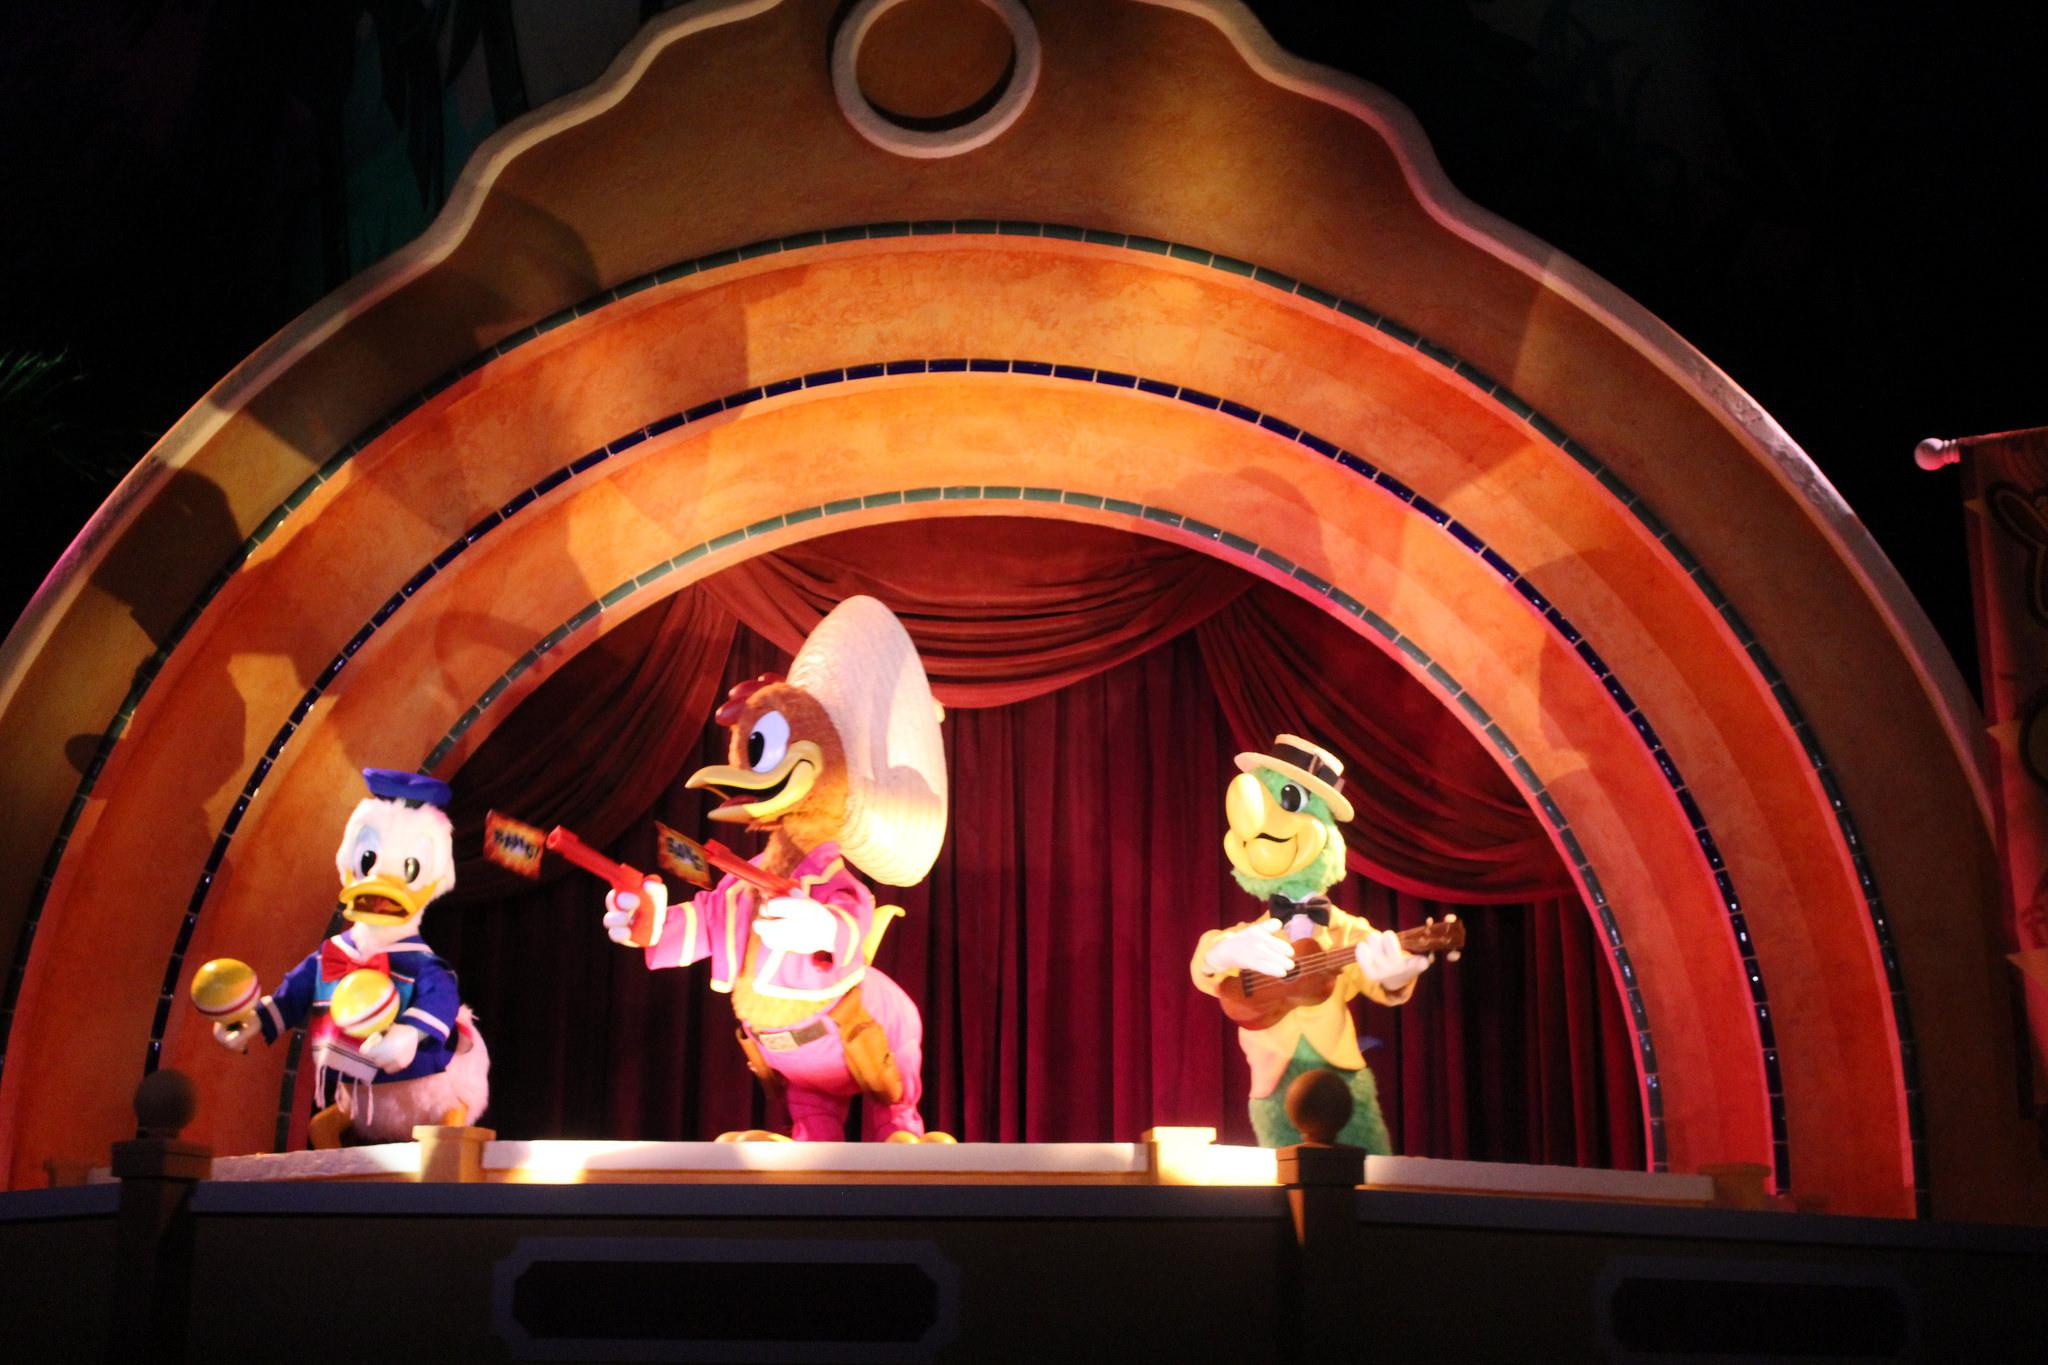 Gran Fiesta Tour featuring the Three Caballeros